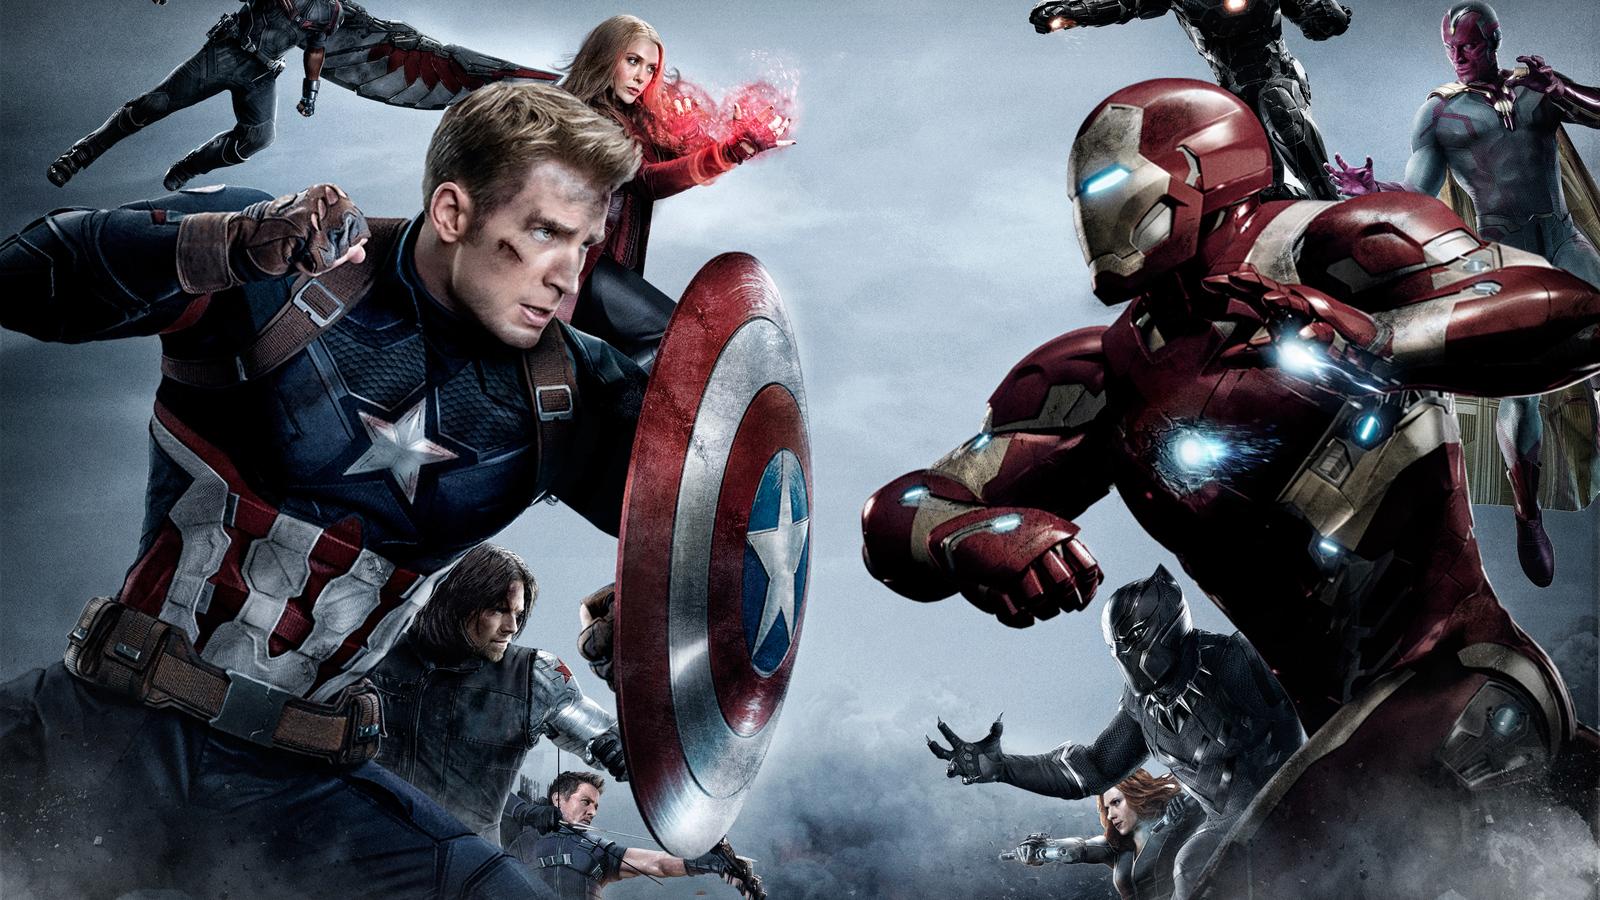 1600x900 Captain America Vs Iron Man Team 1600x900 Resolution Hd